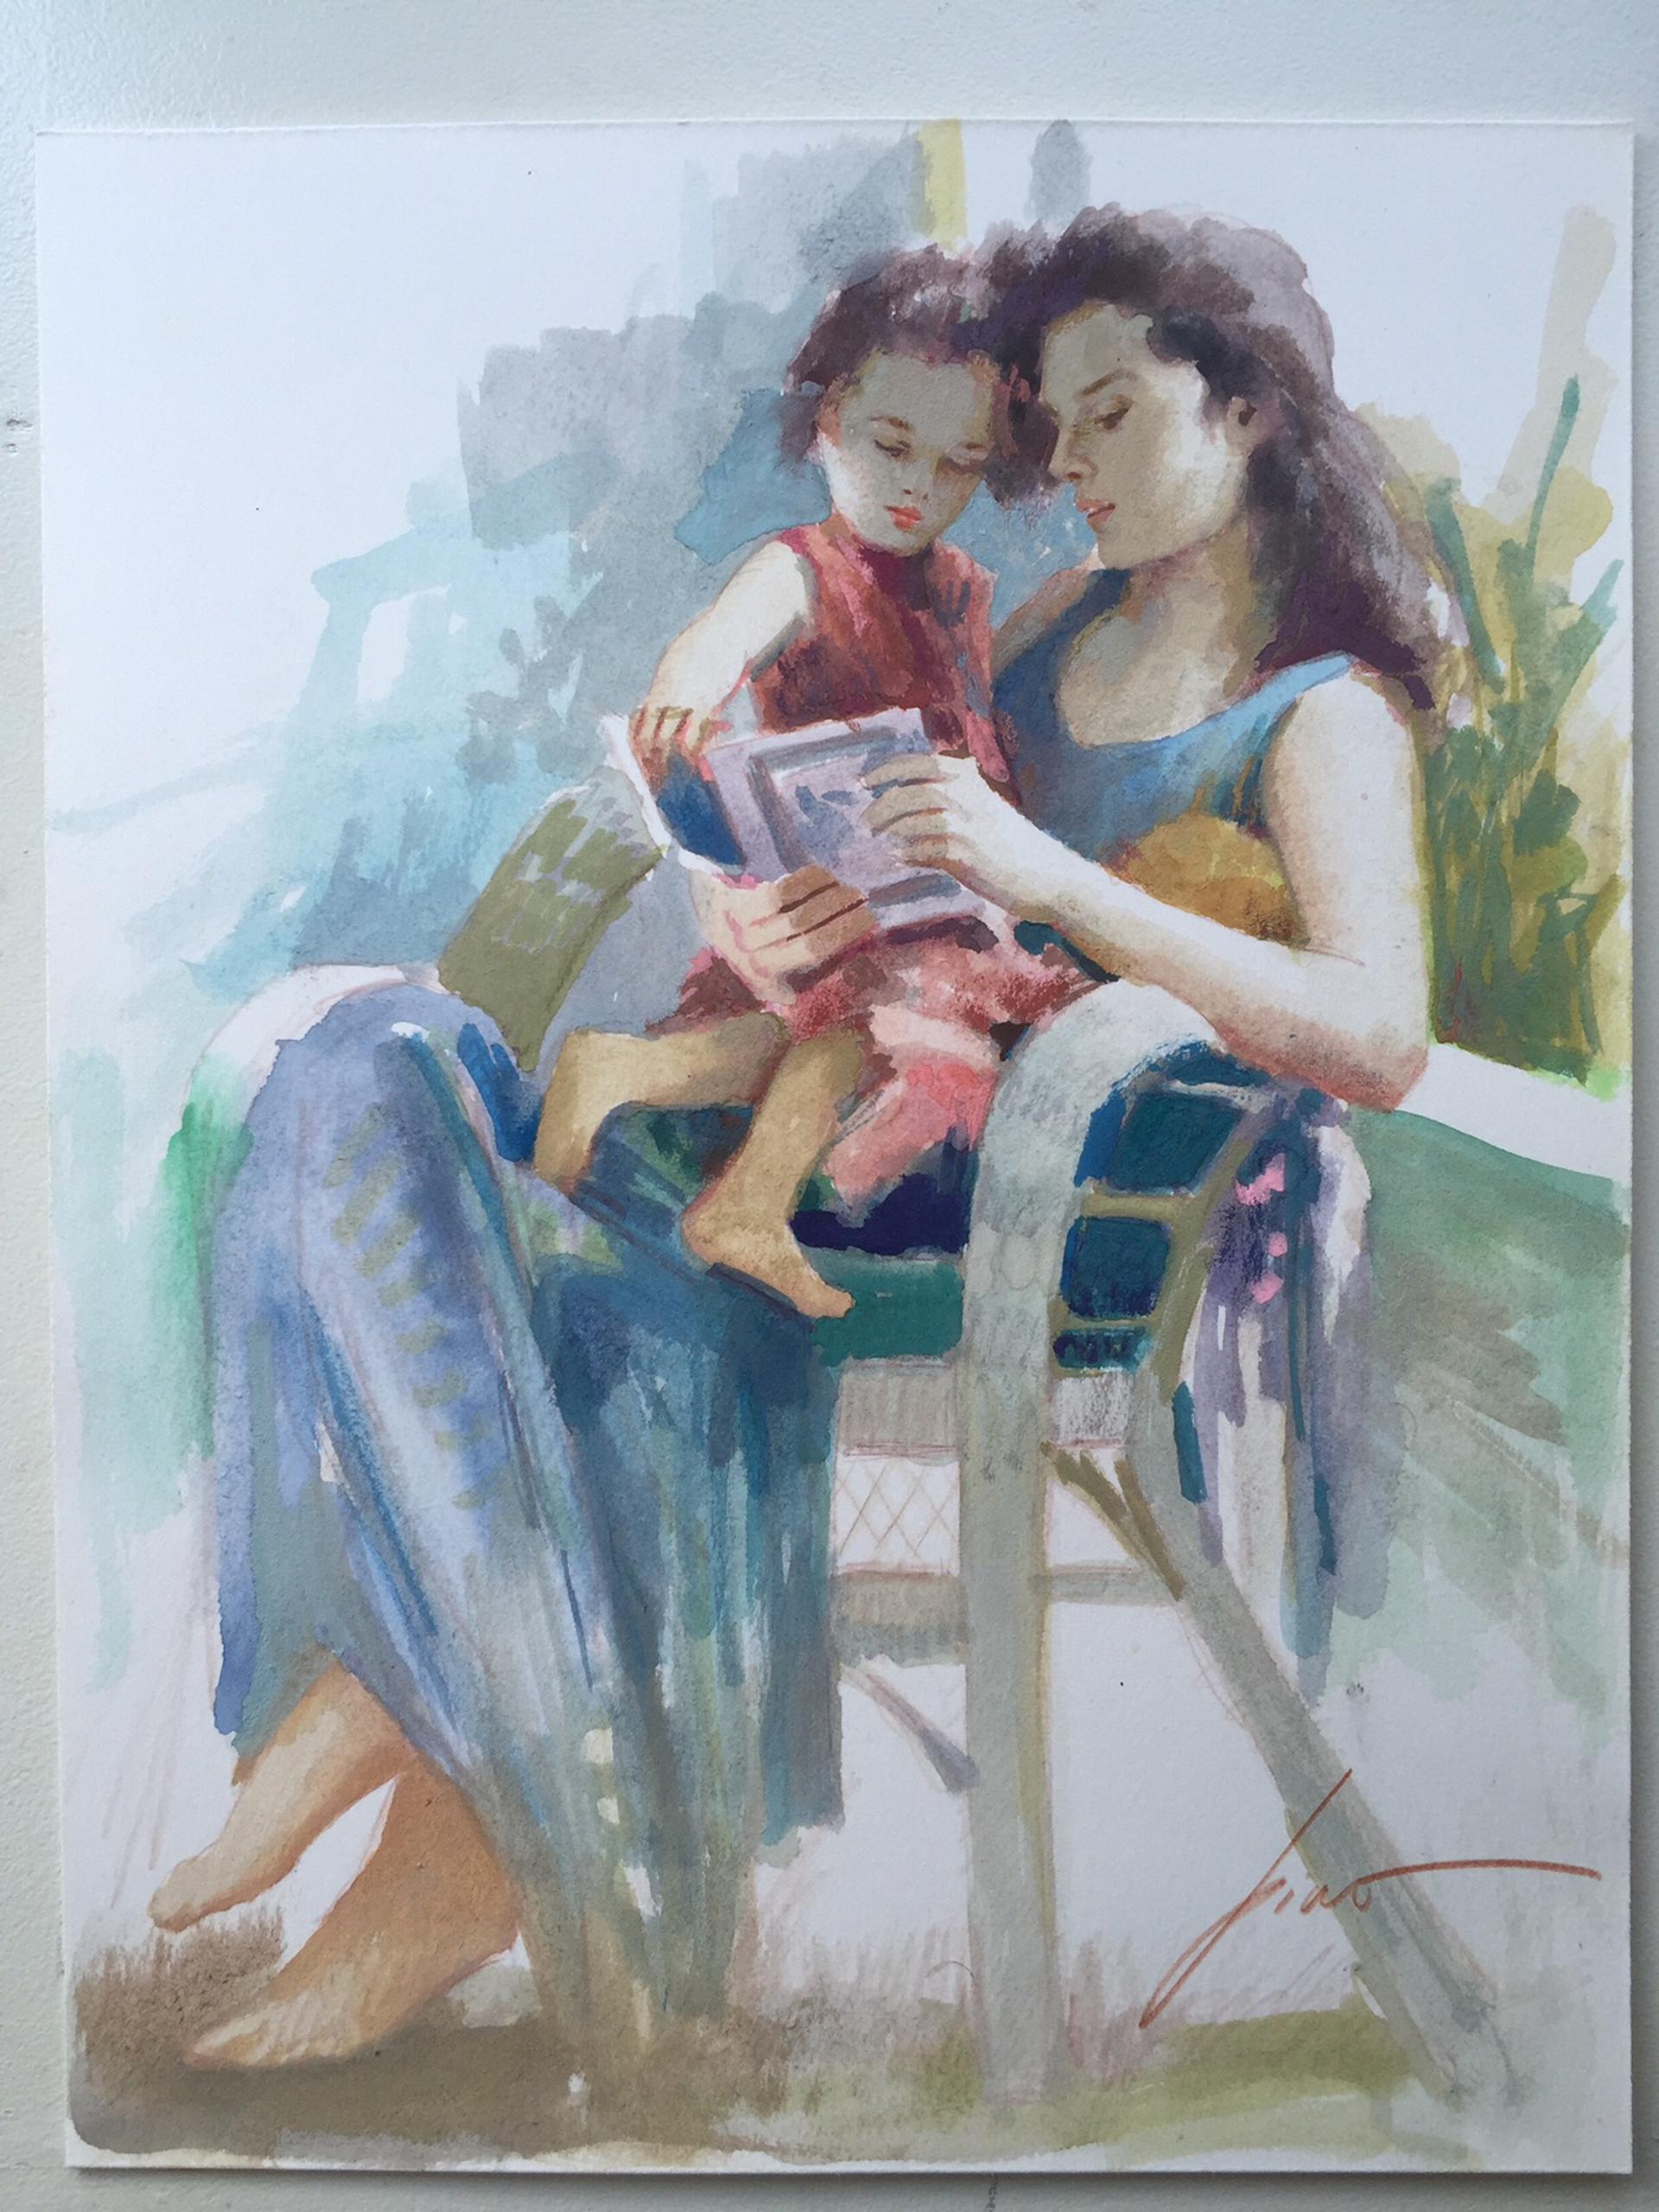 Original Watercolor Release 1 by Pino